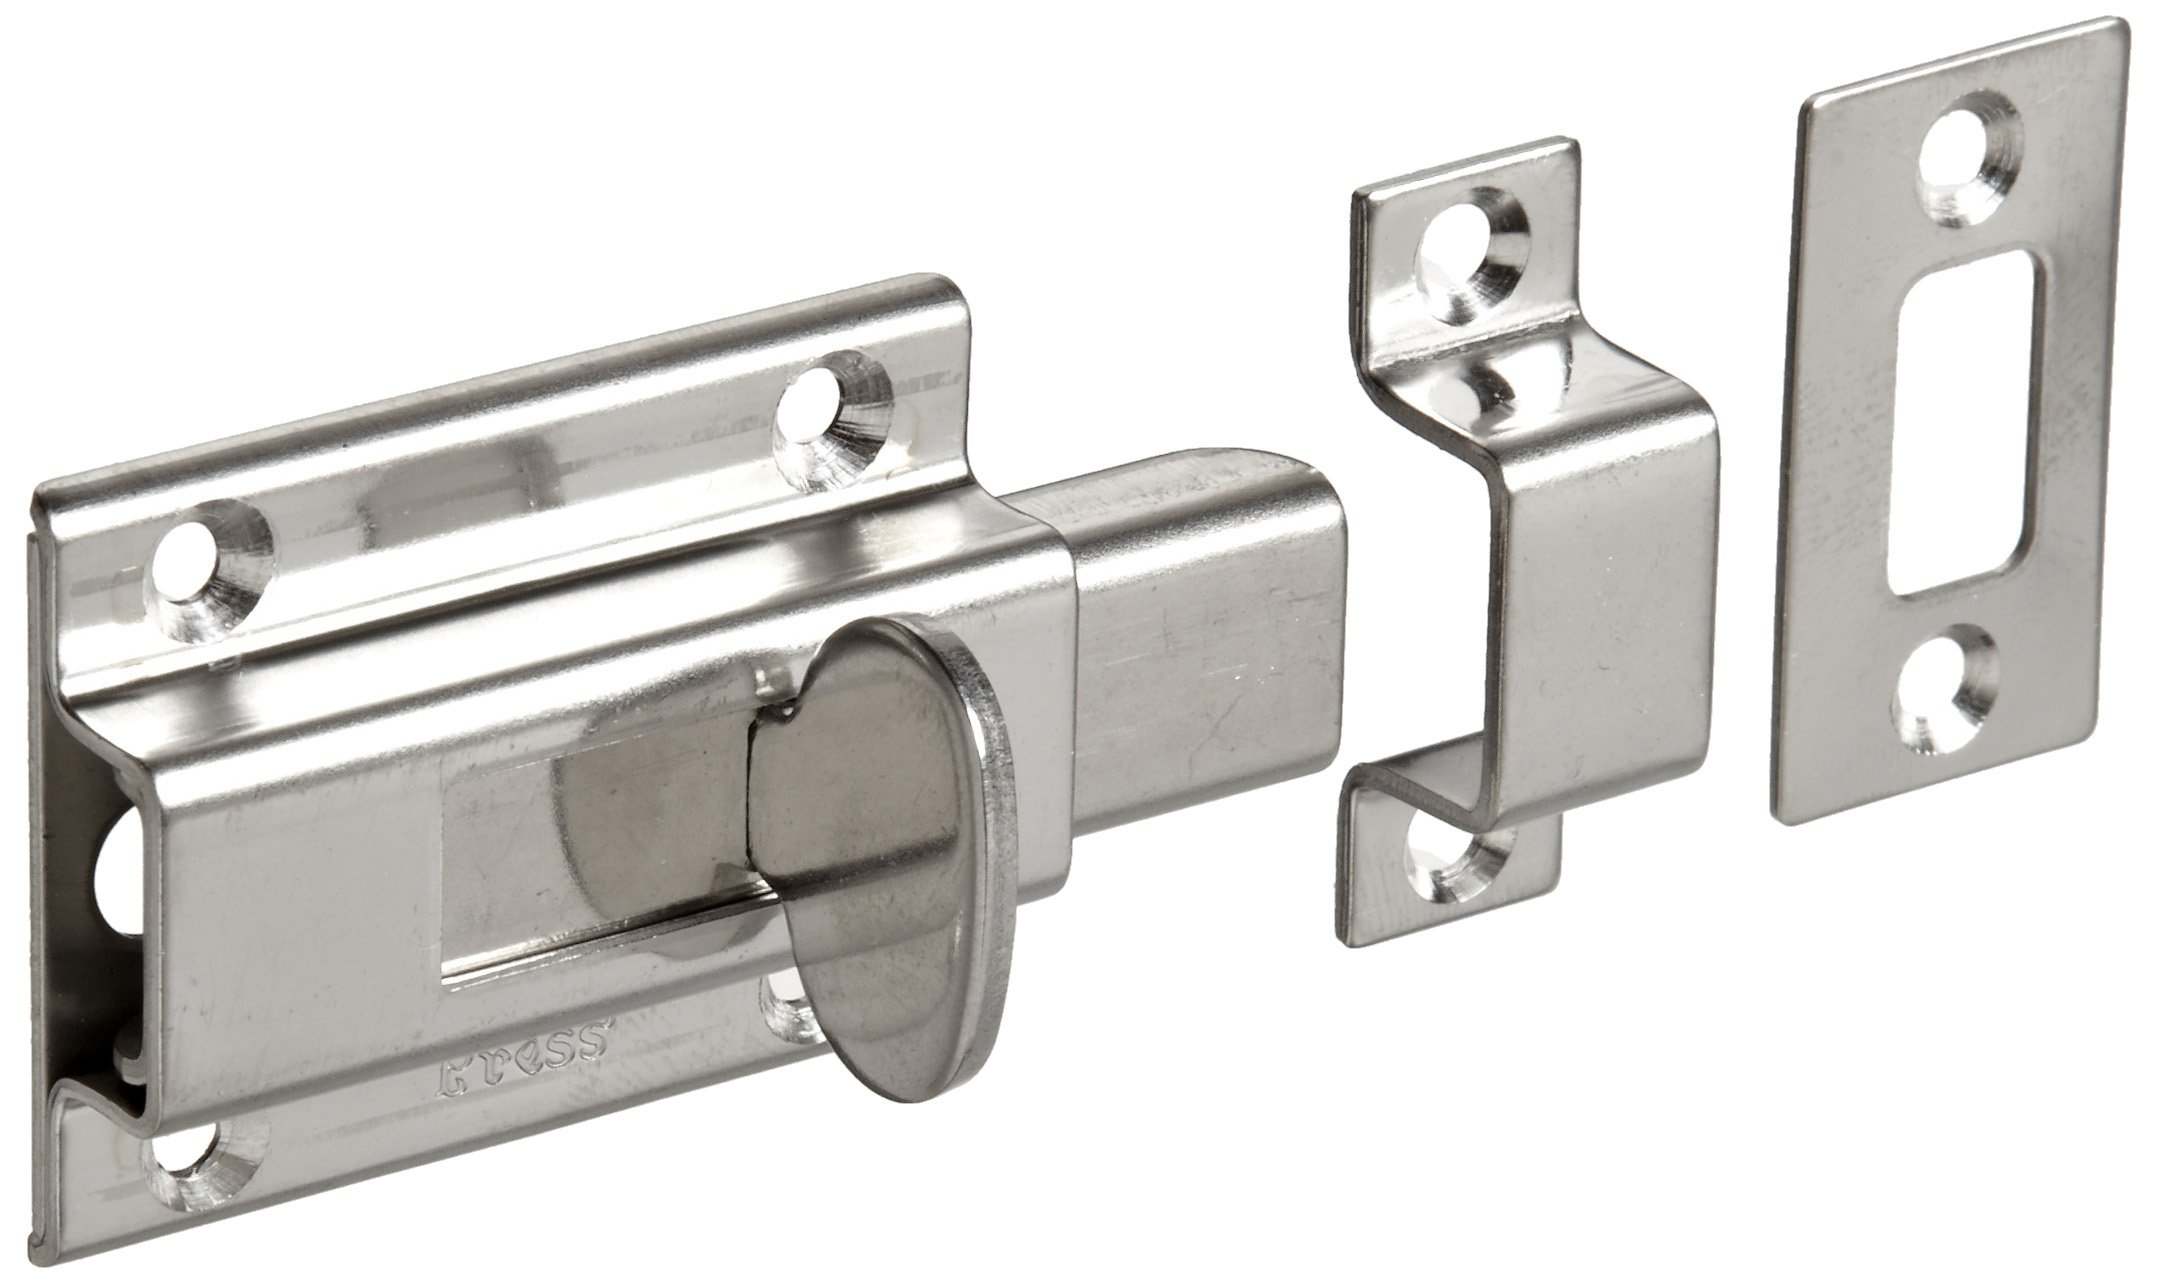 Stainless Steel 304 Slide Bolt Latch, Satin Finish, Non Locking, 1-31/32'' Bolt Plate Length, 53/64'' Throw Plate Length (Pack of 1)